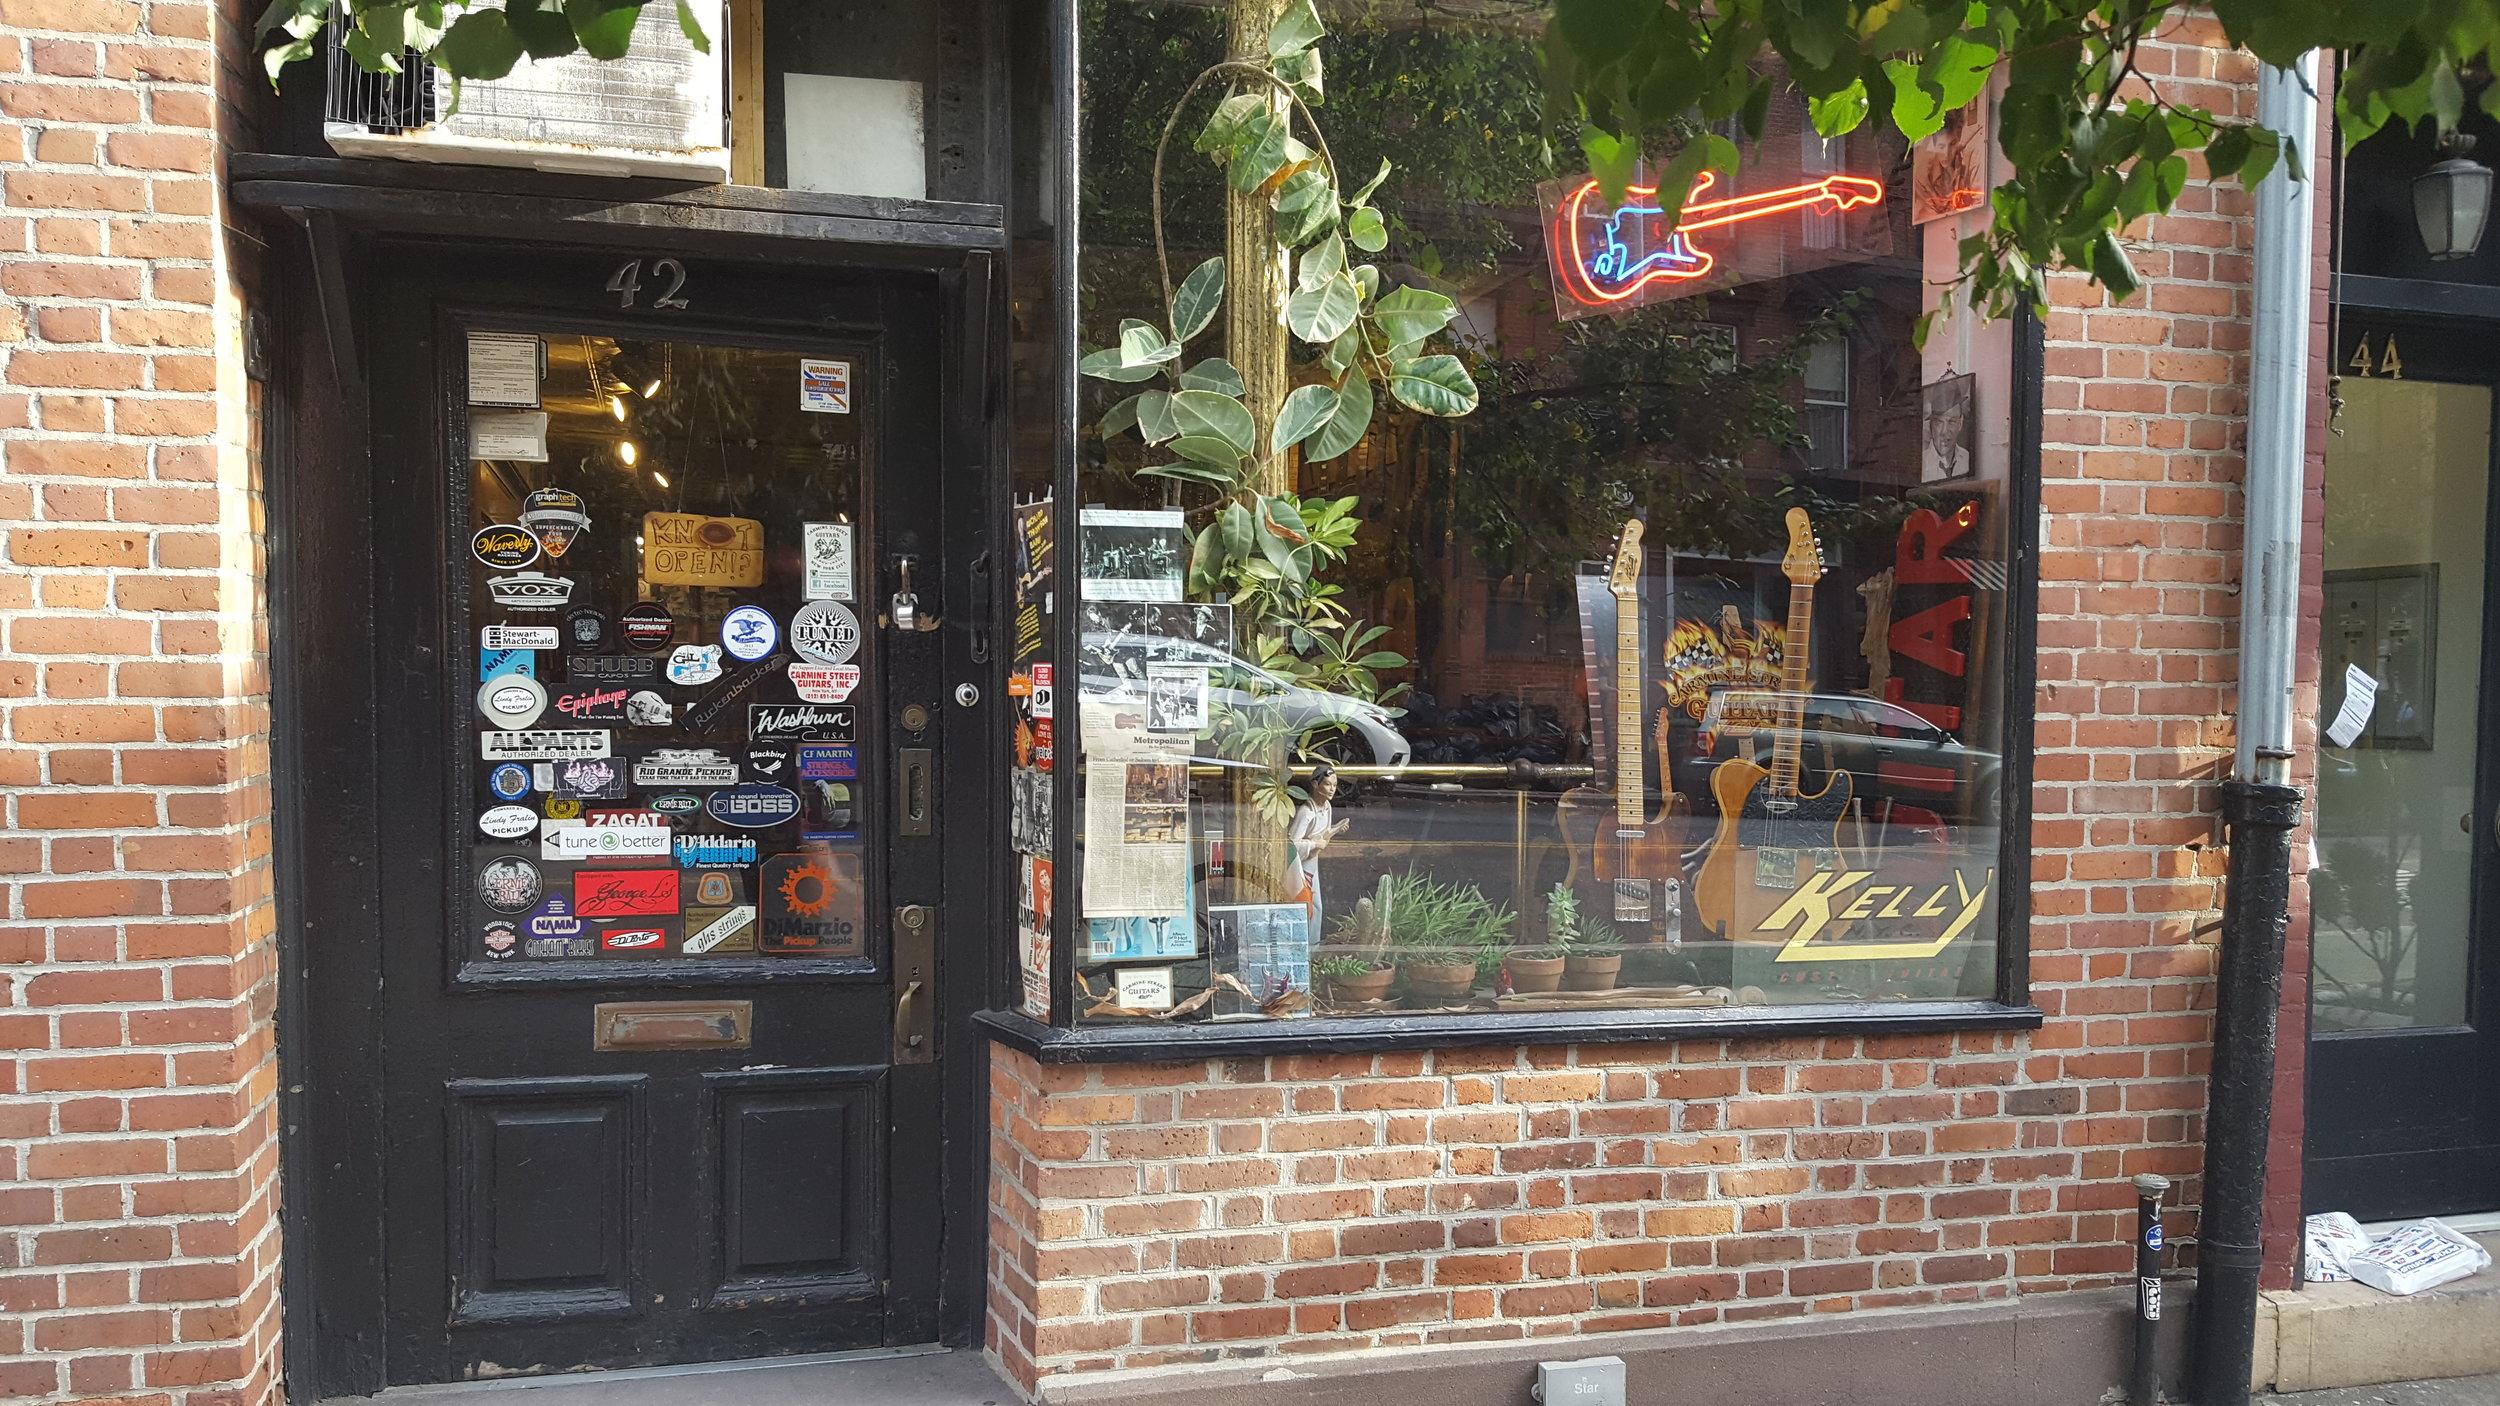 Carmine Street Guitars storefront